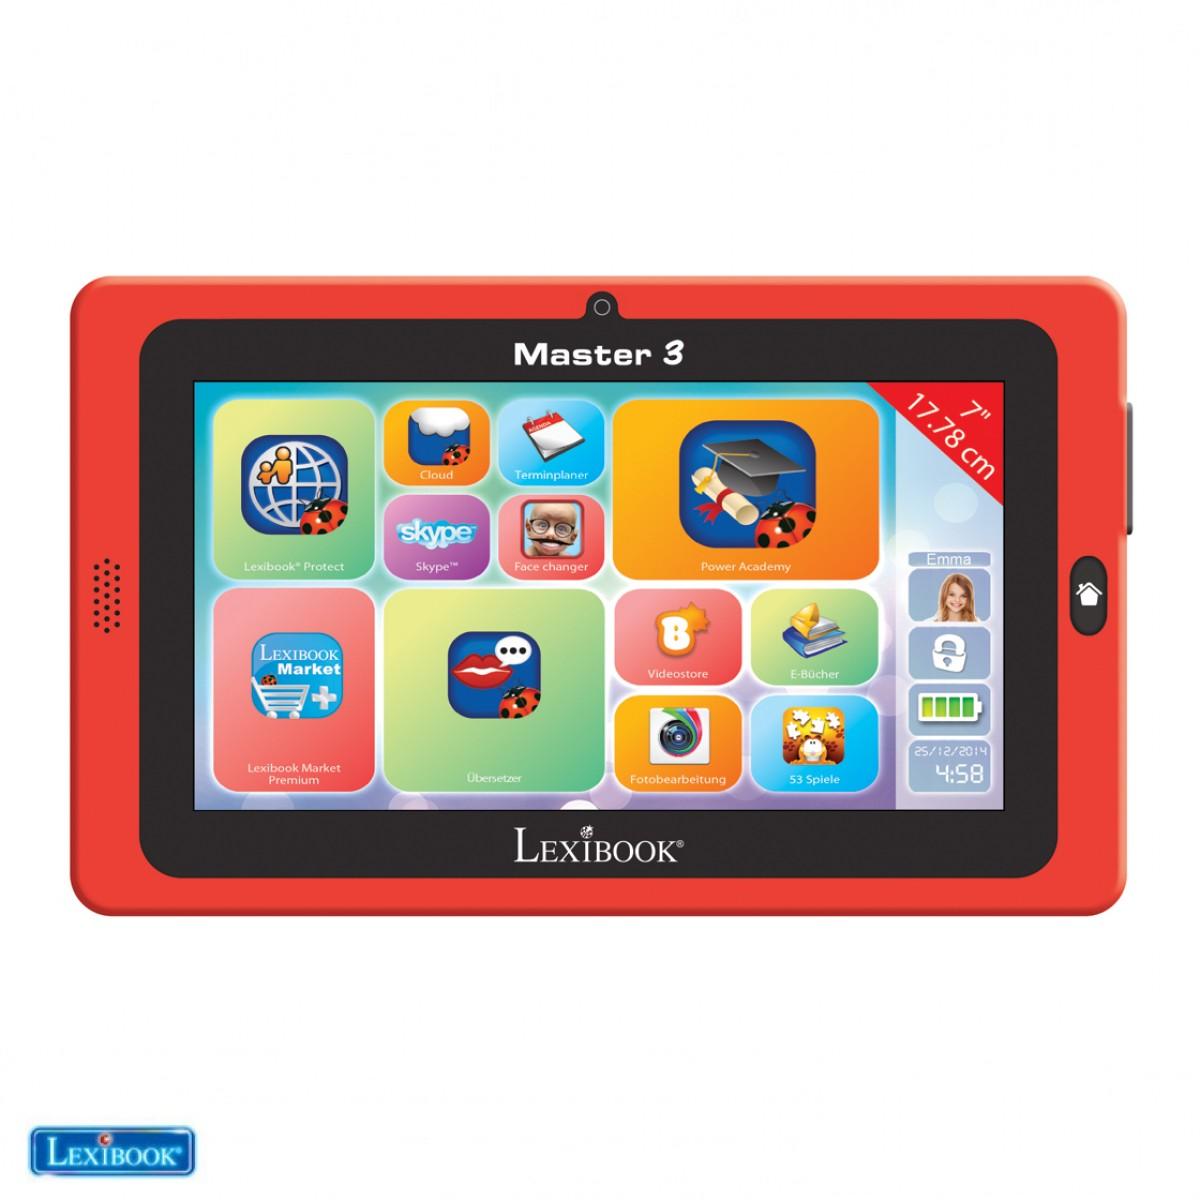 Tablet-PC Master 3